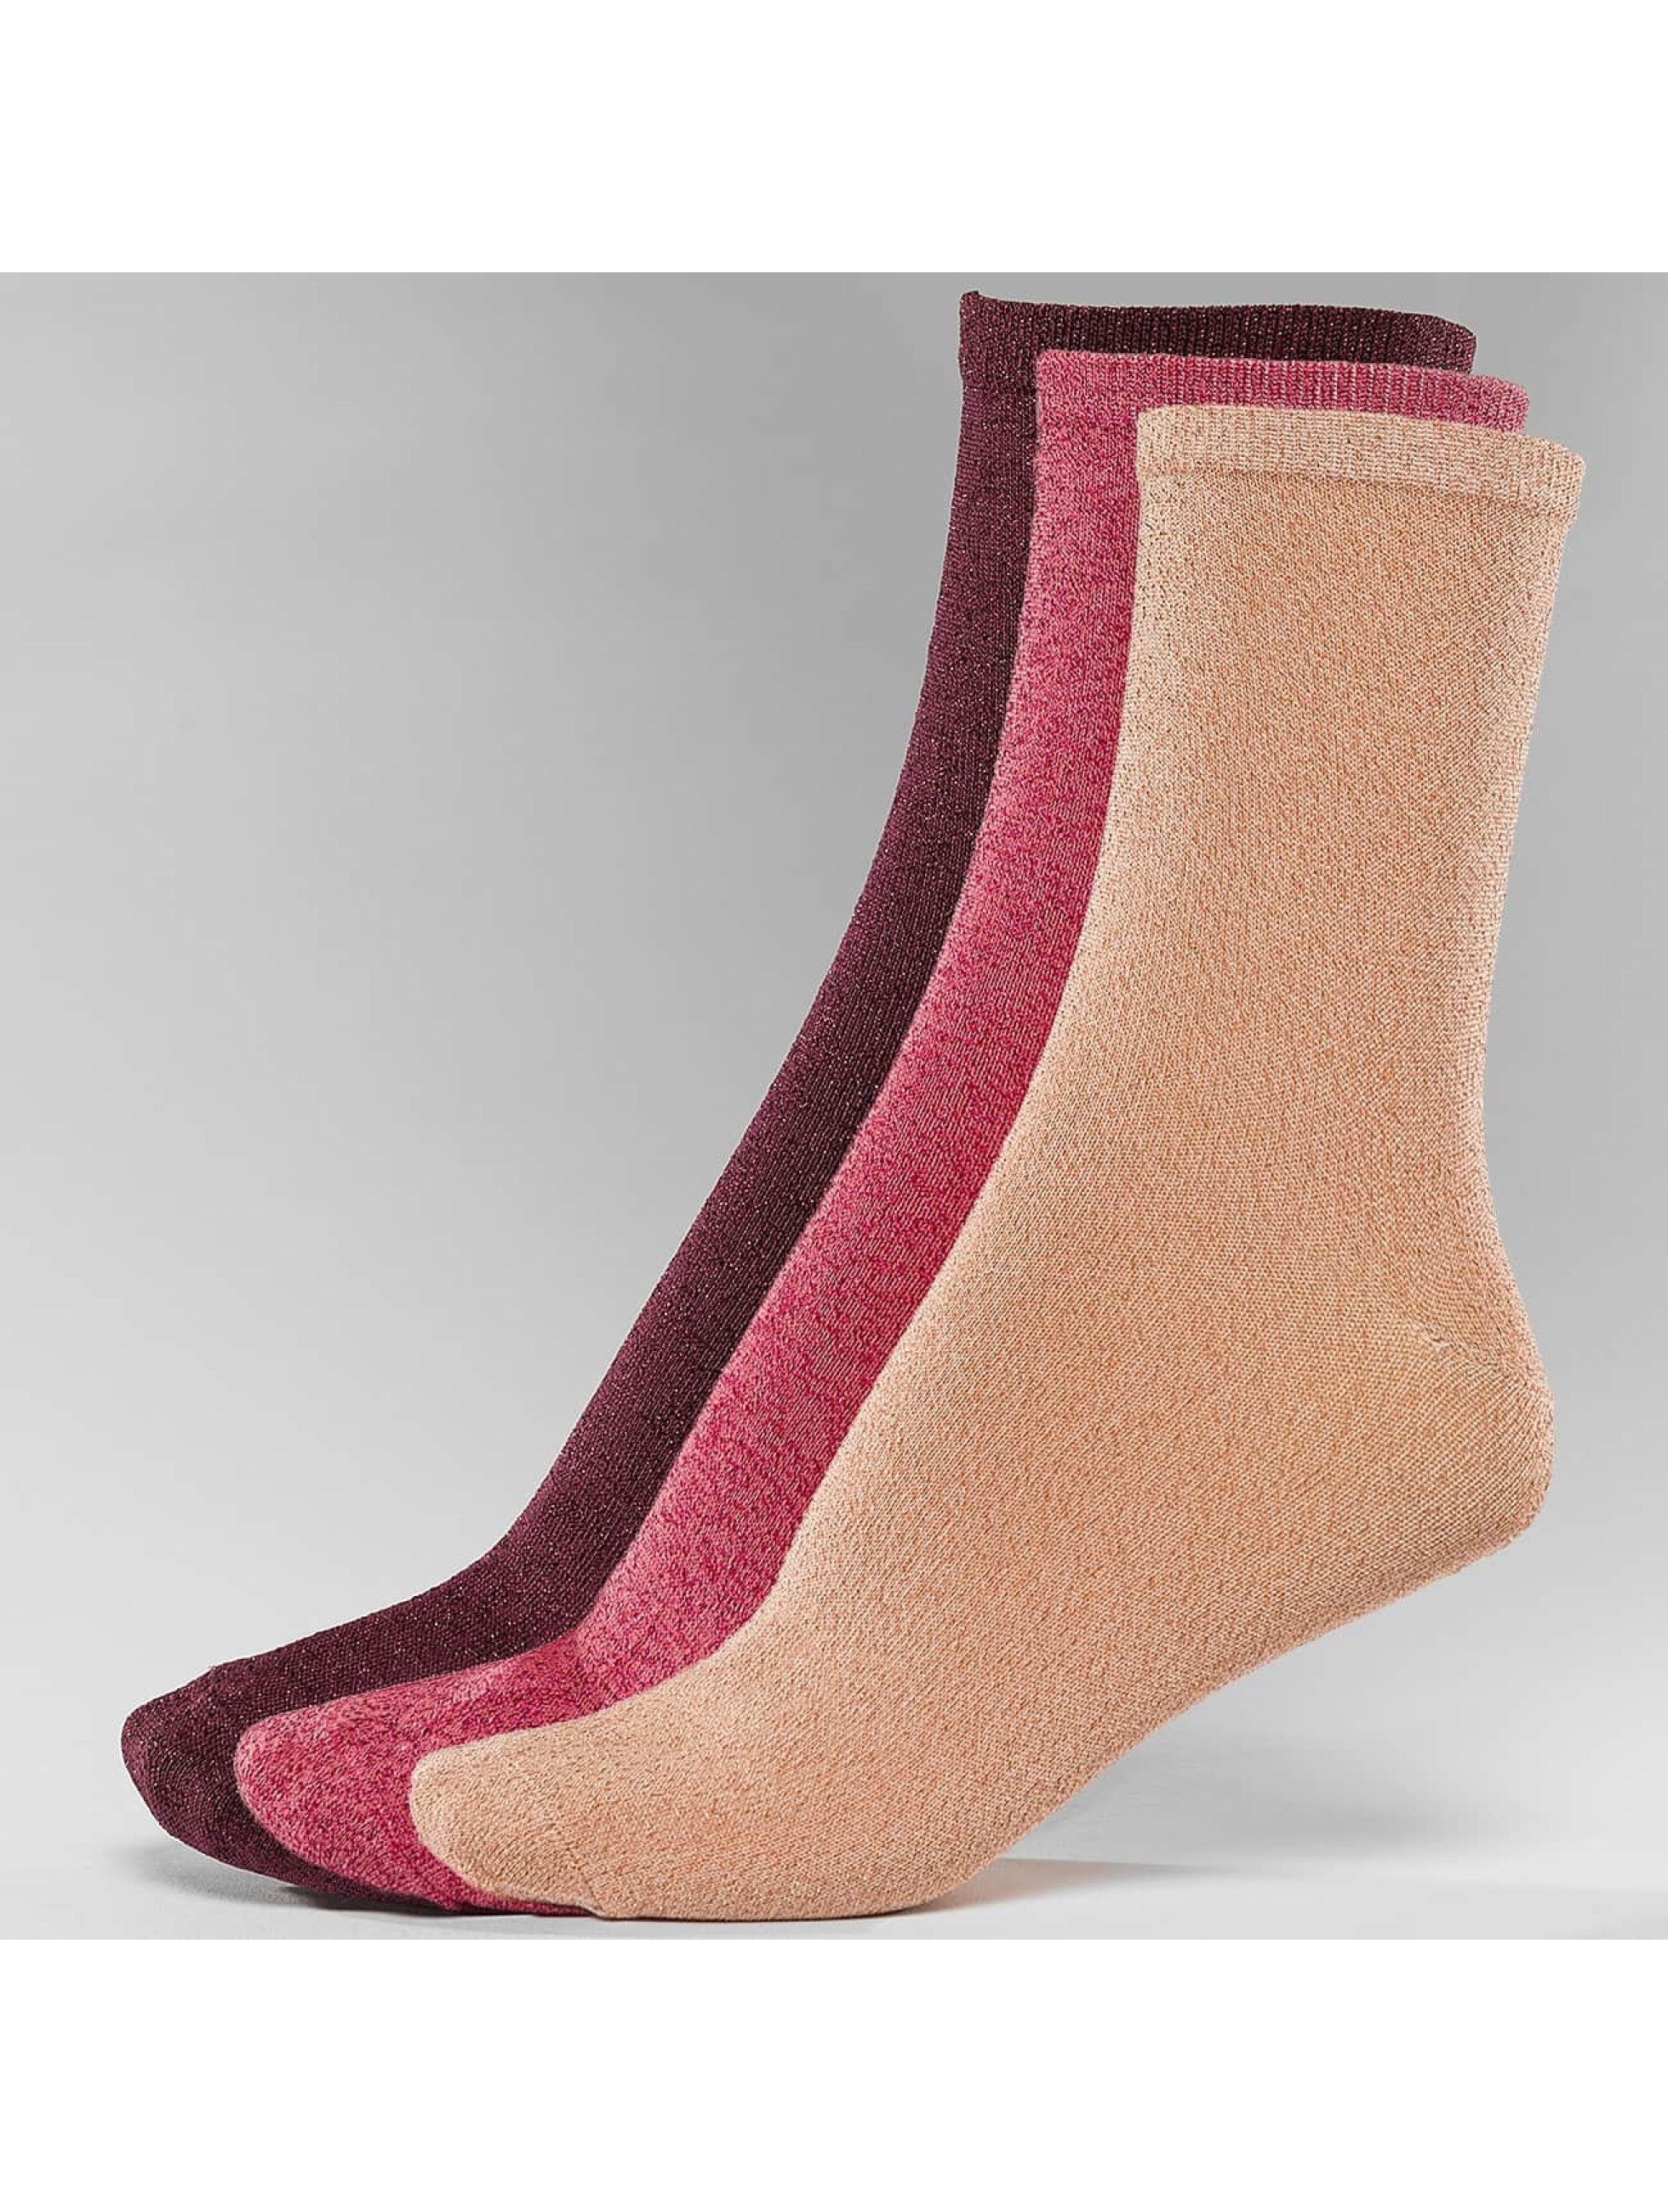 Nümph Frauen Socken Kingcity 3-Pack Glitter in bunt